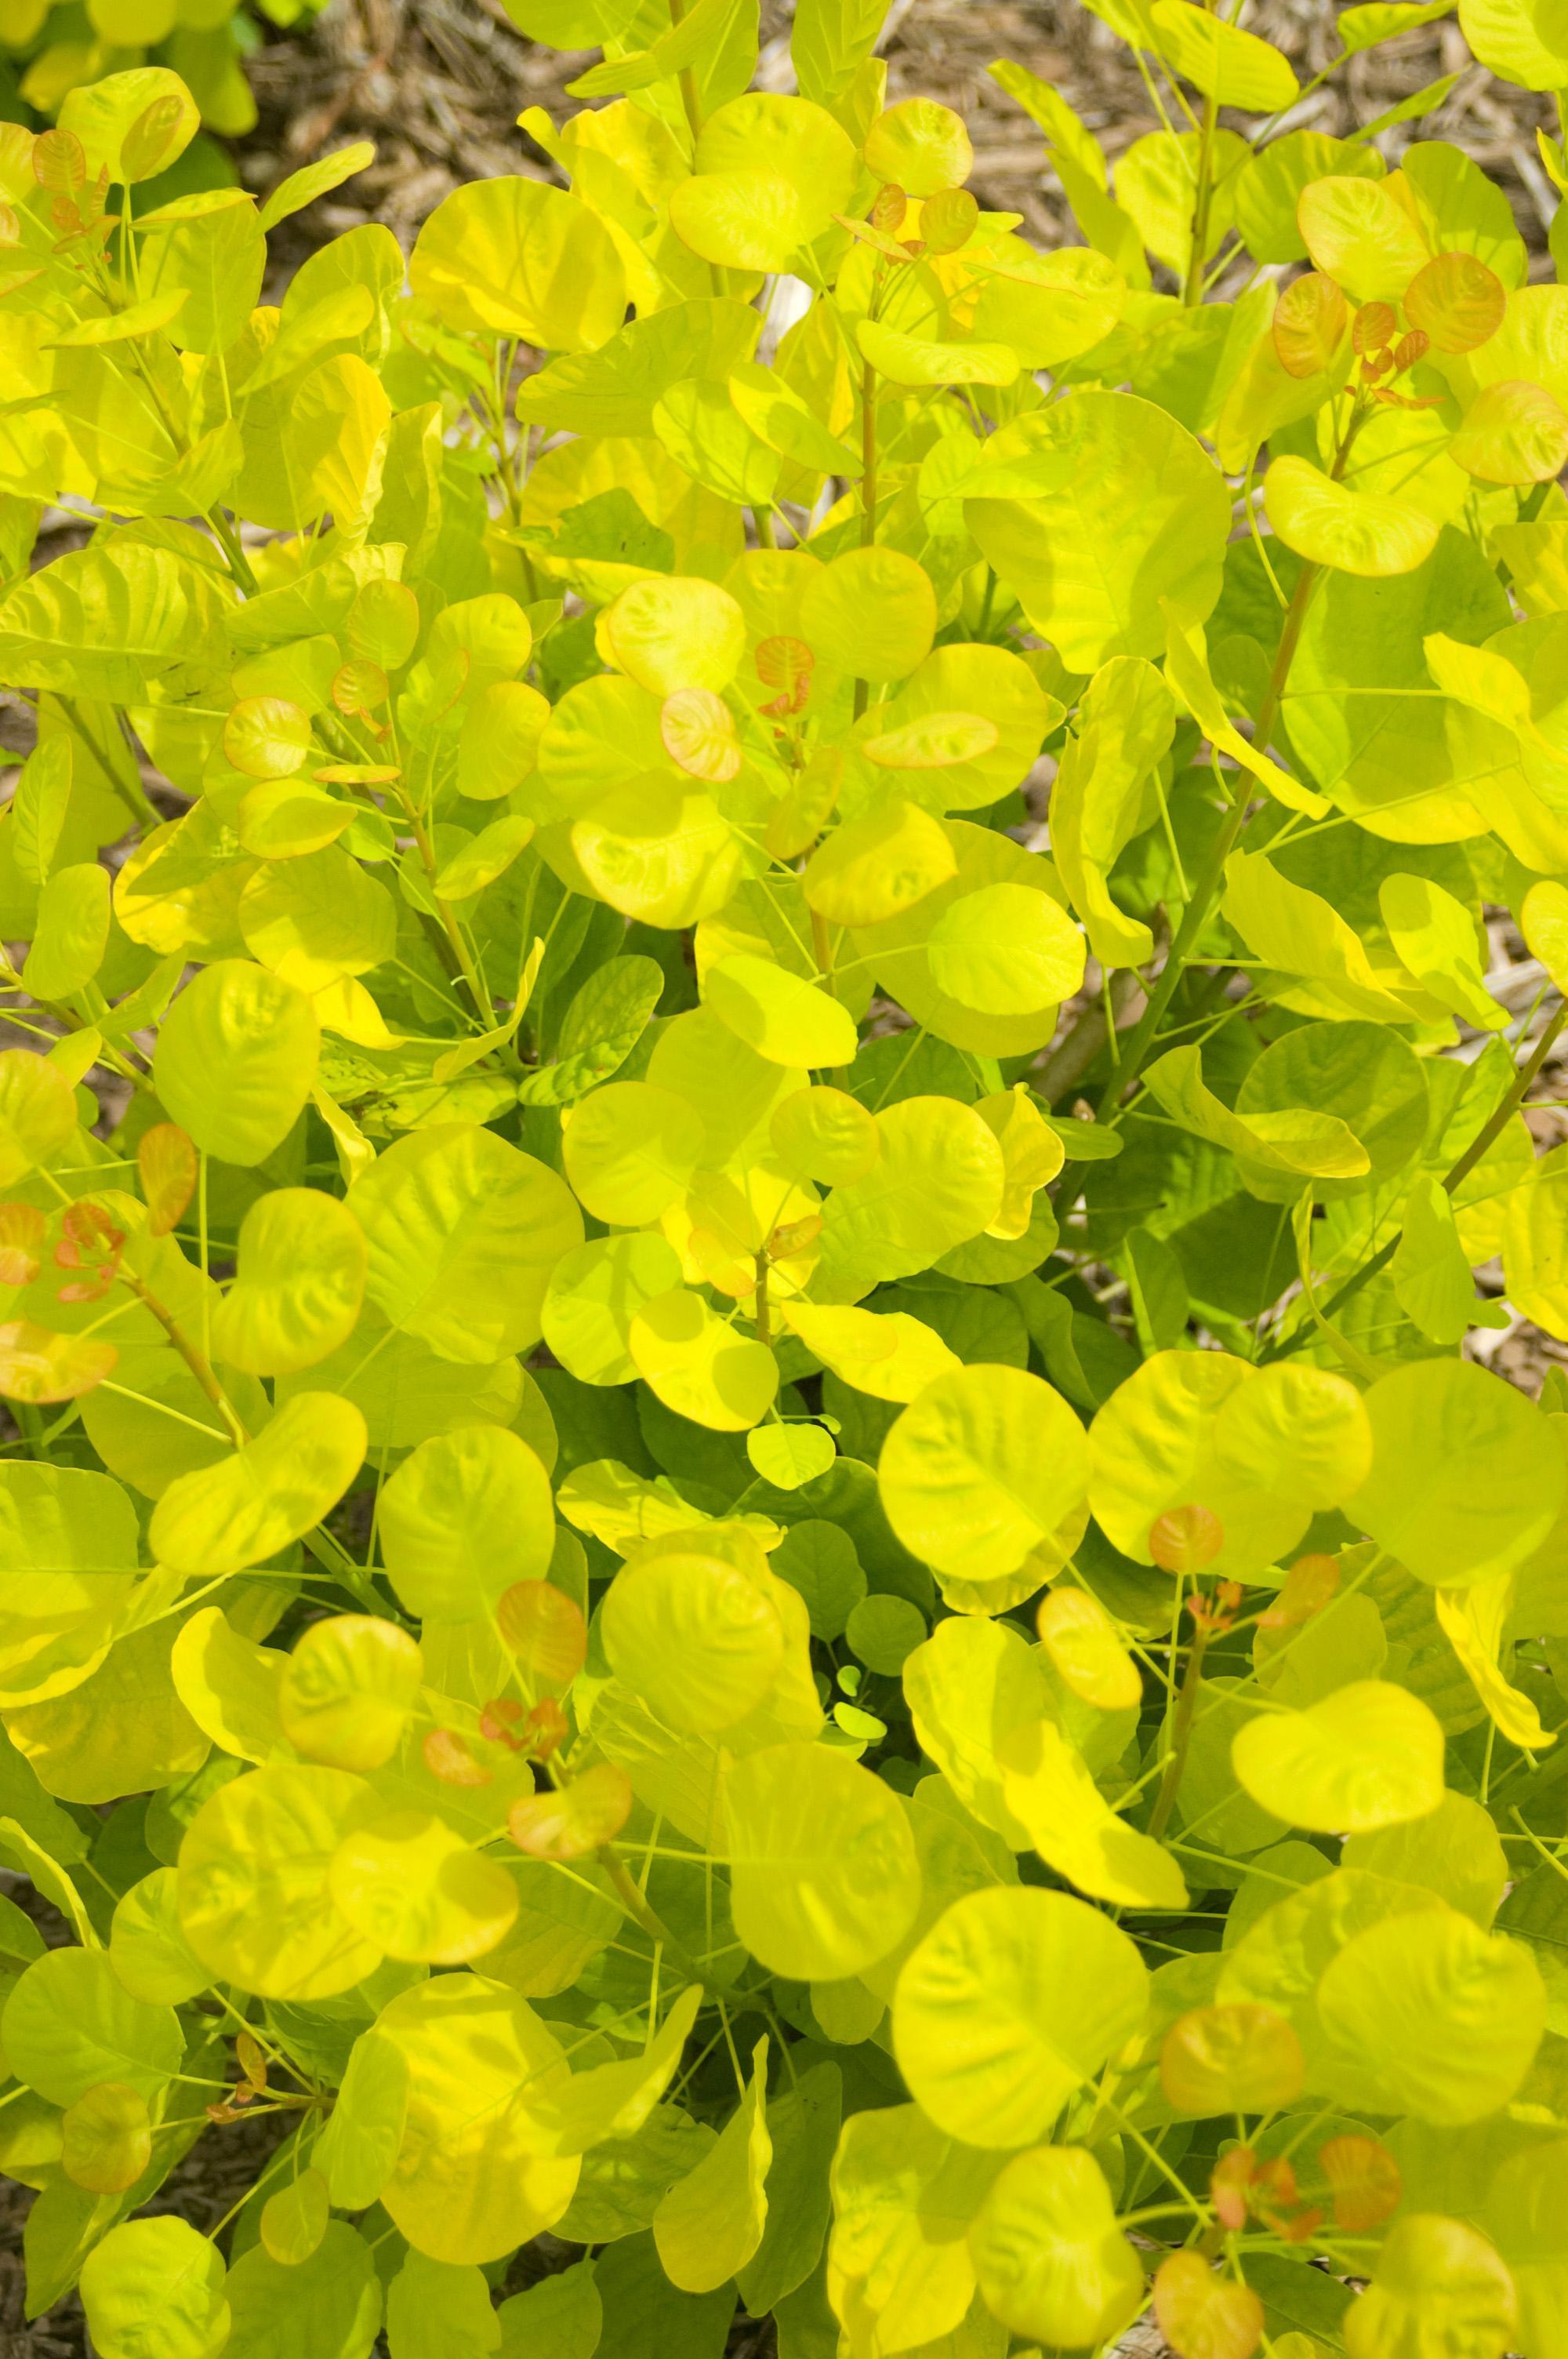 Cotinus cogg. 'Golden Spirit' foliage